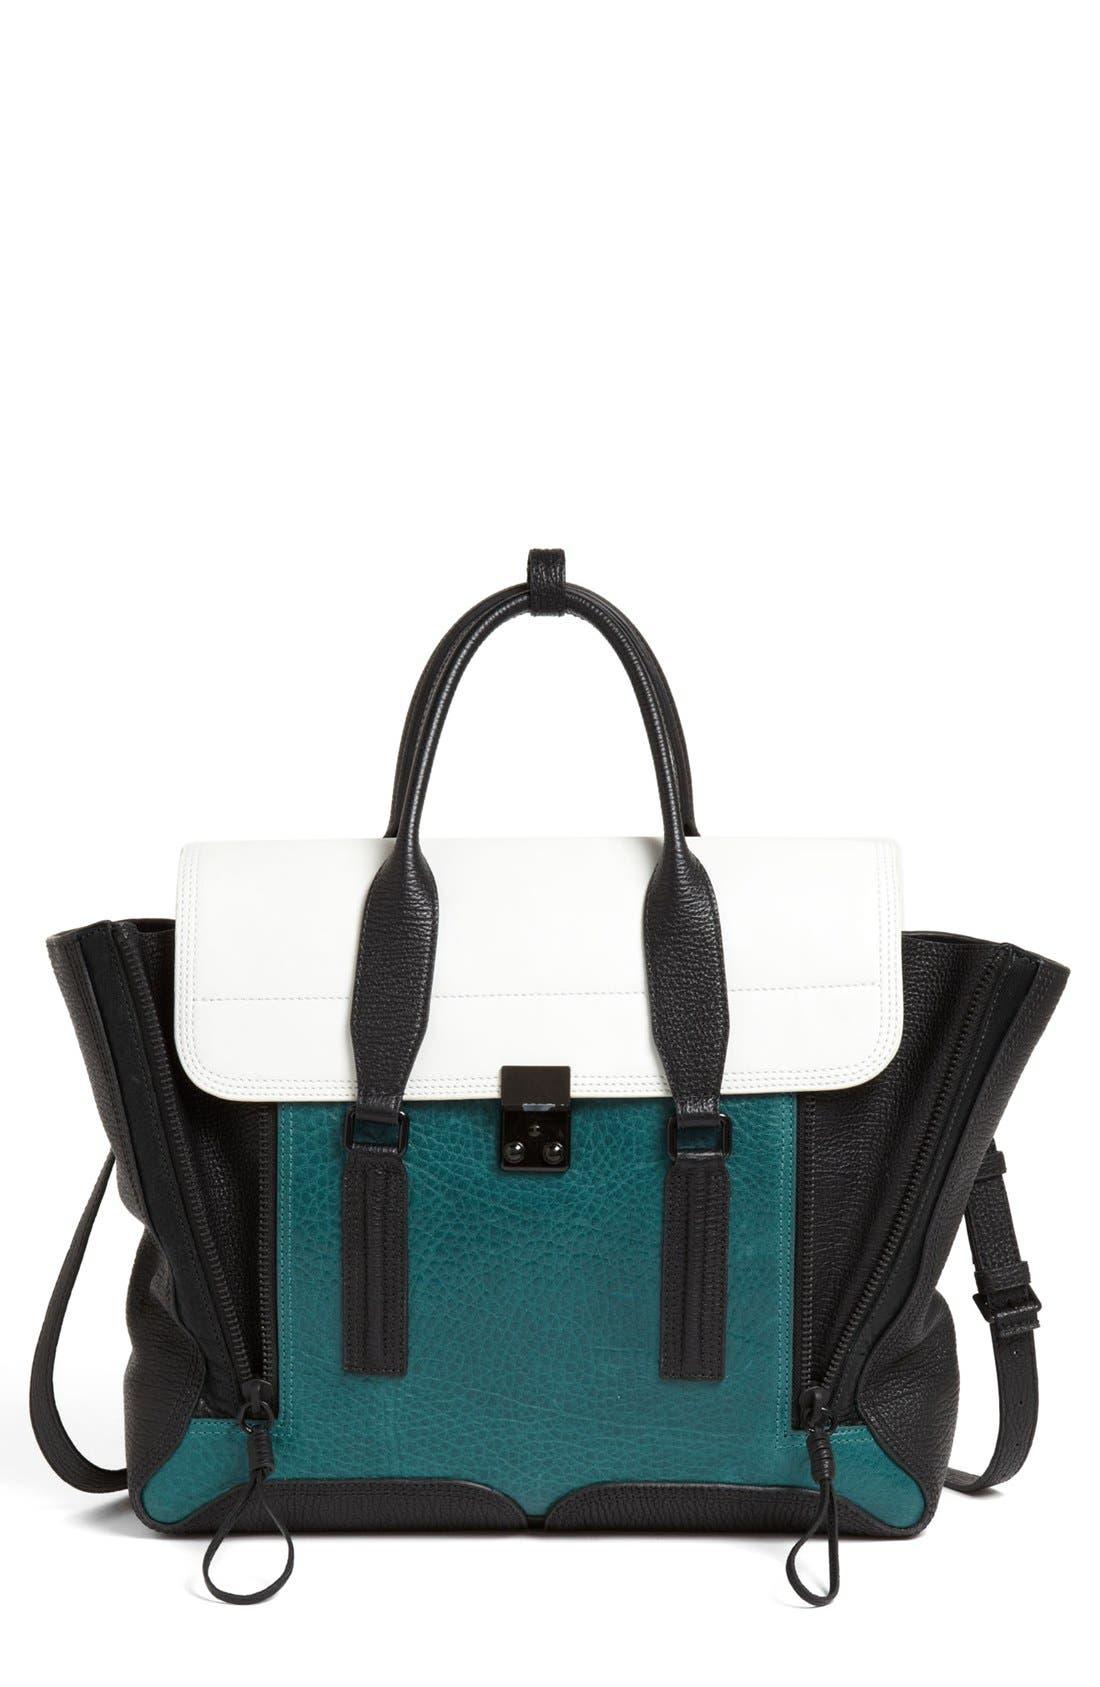 Alternate Image 1 Selected - 3.1 Phillip Lim 'Pashli' Colorblock Leather Crossbody Satchel (Nordstrom Exclusive)